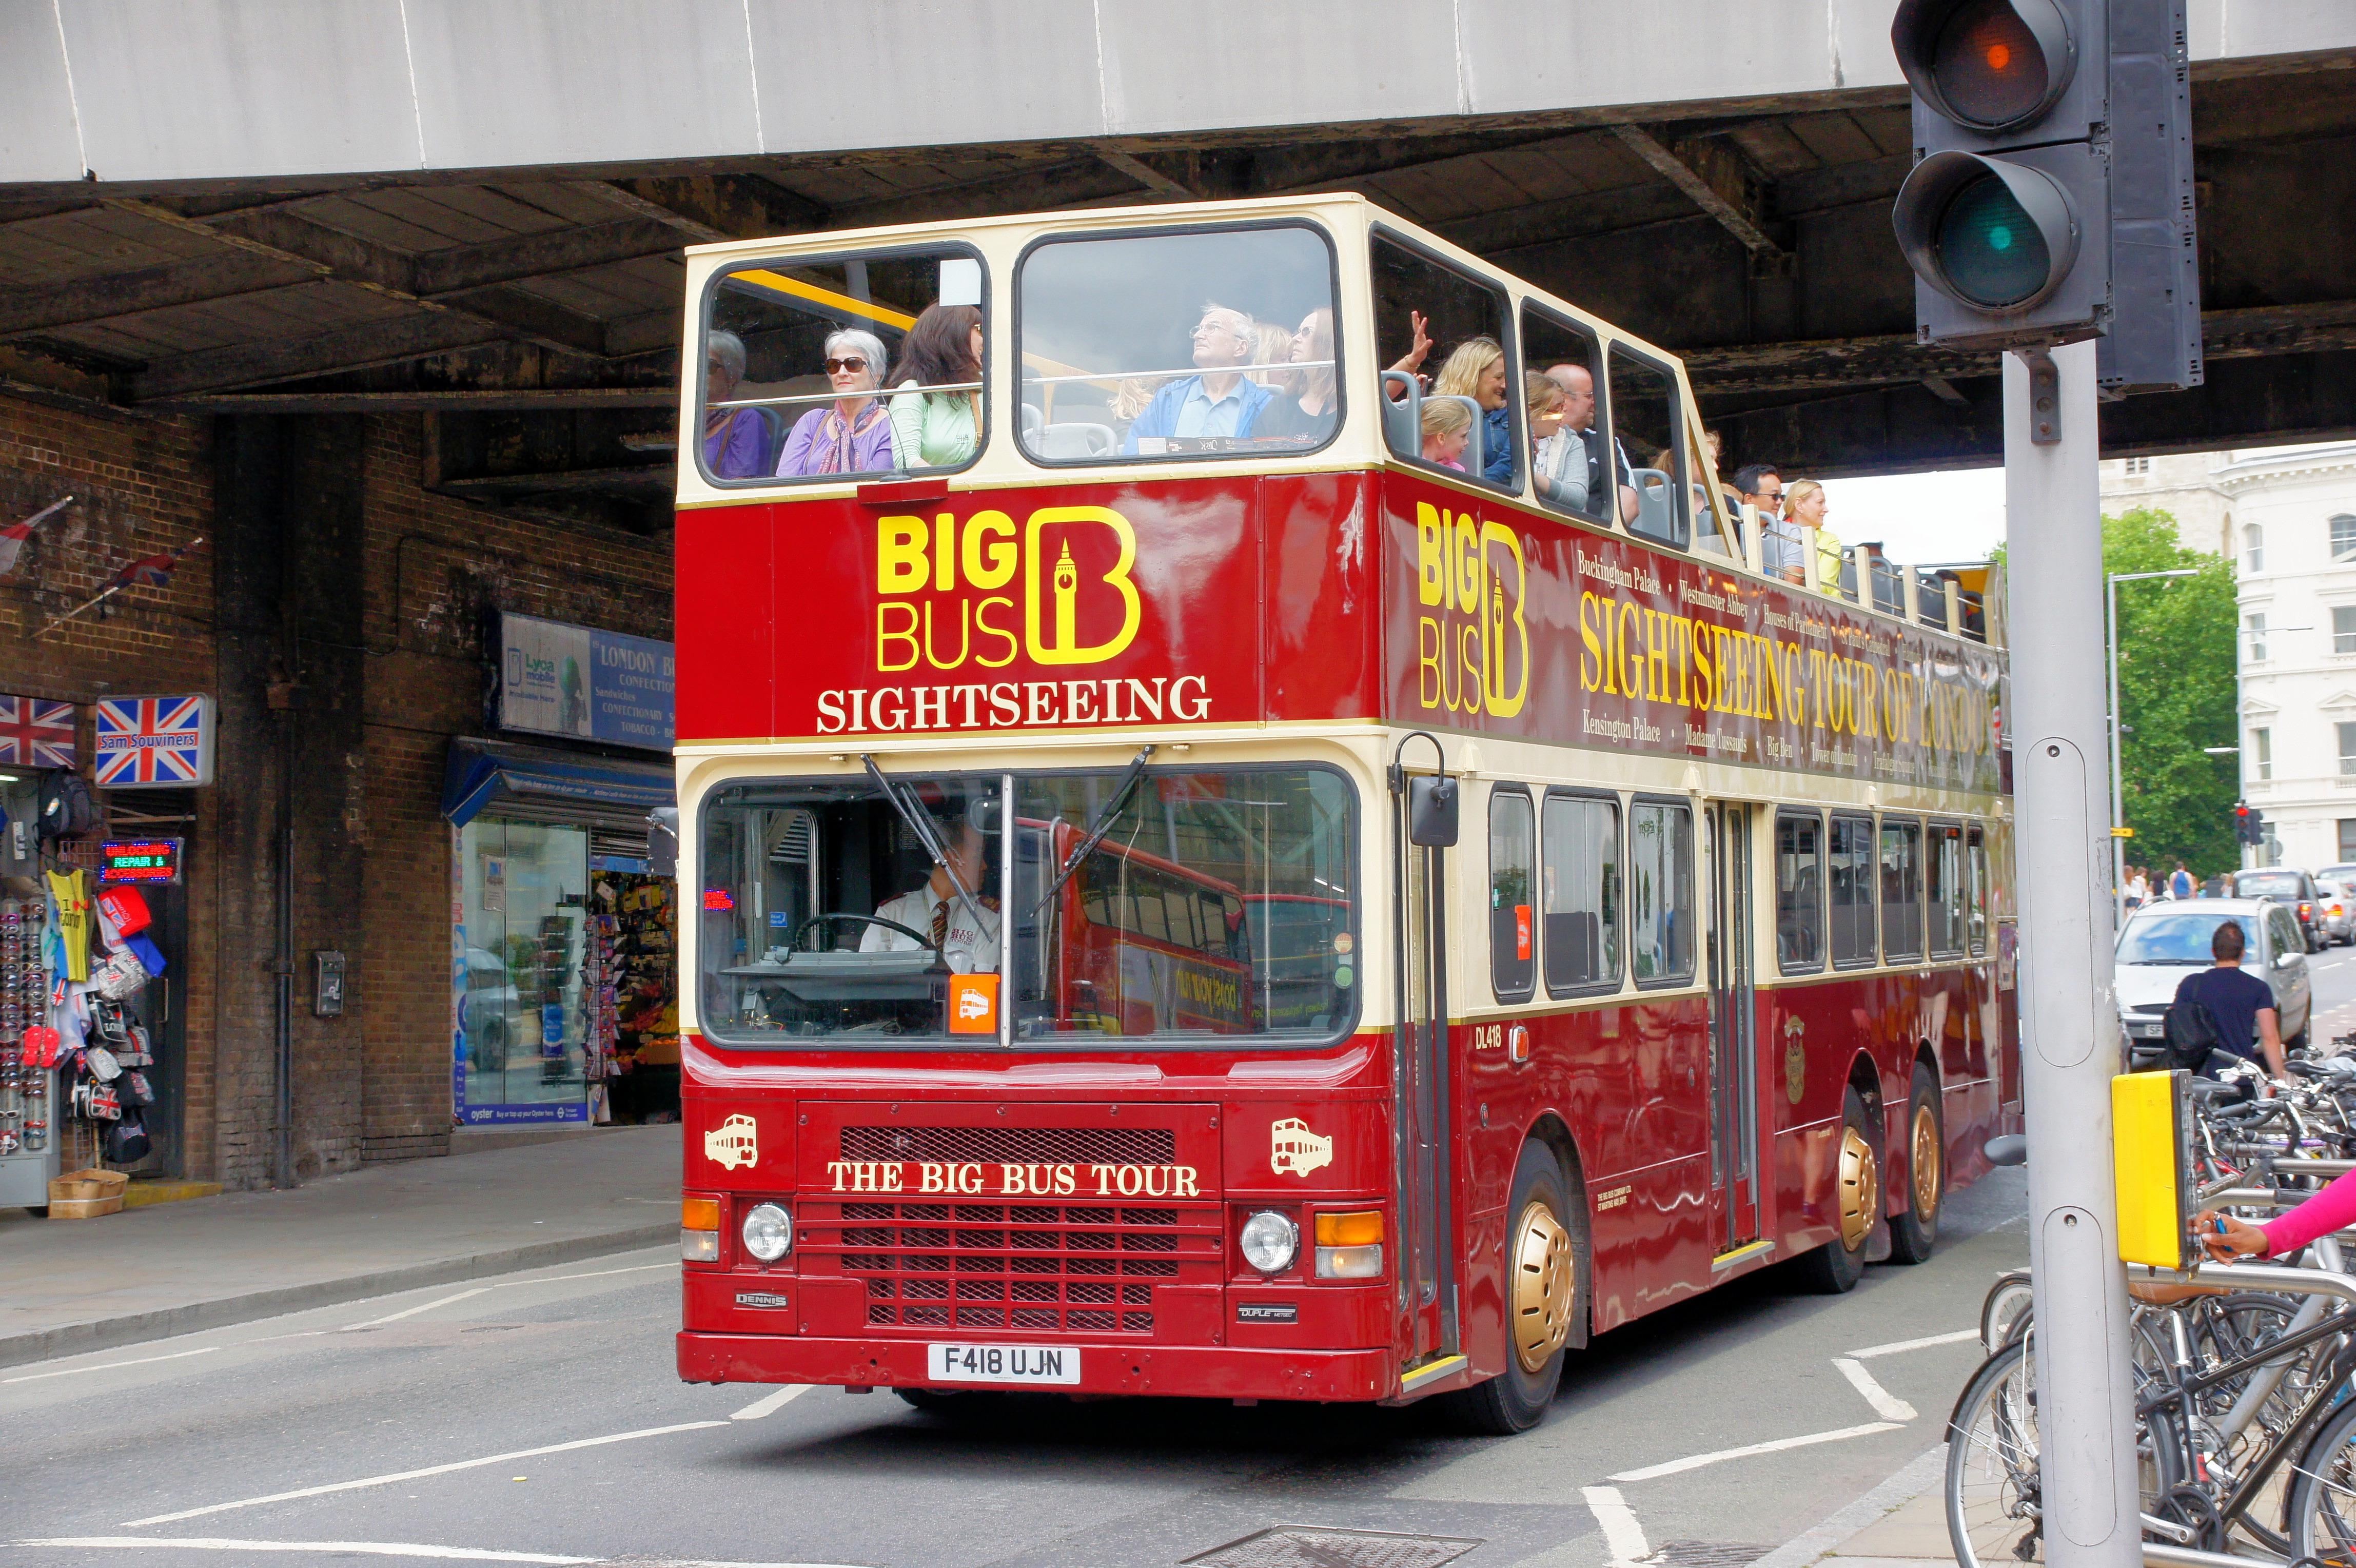 1558676850_the_big_bus_company_bus_dl418_(f418_ujn)__11_august_2013.jpg